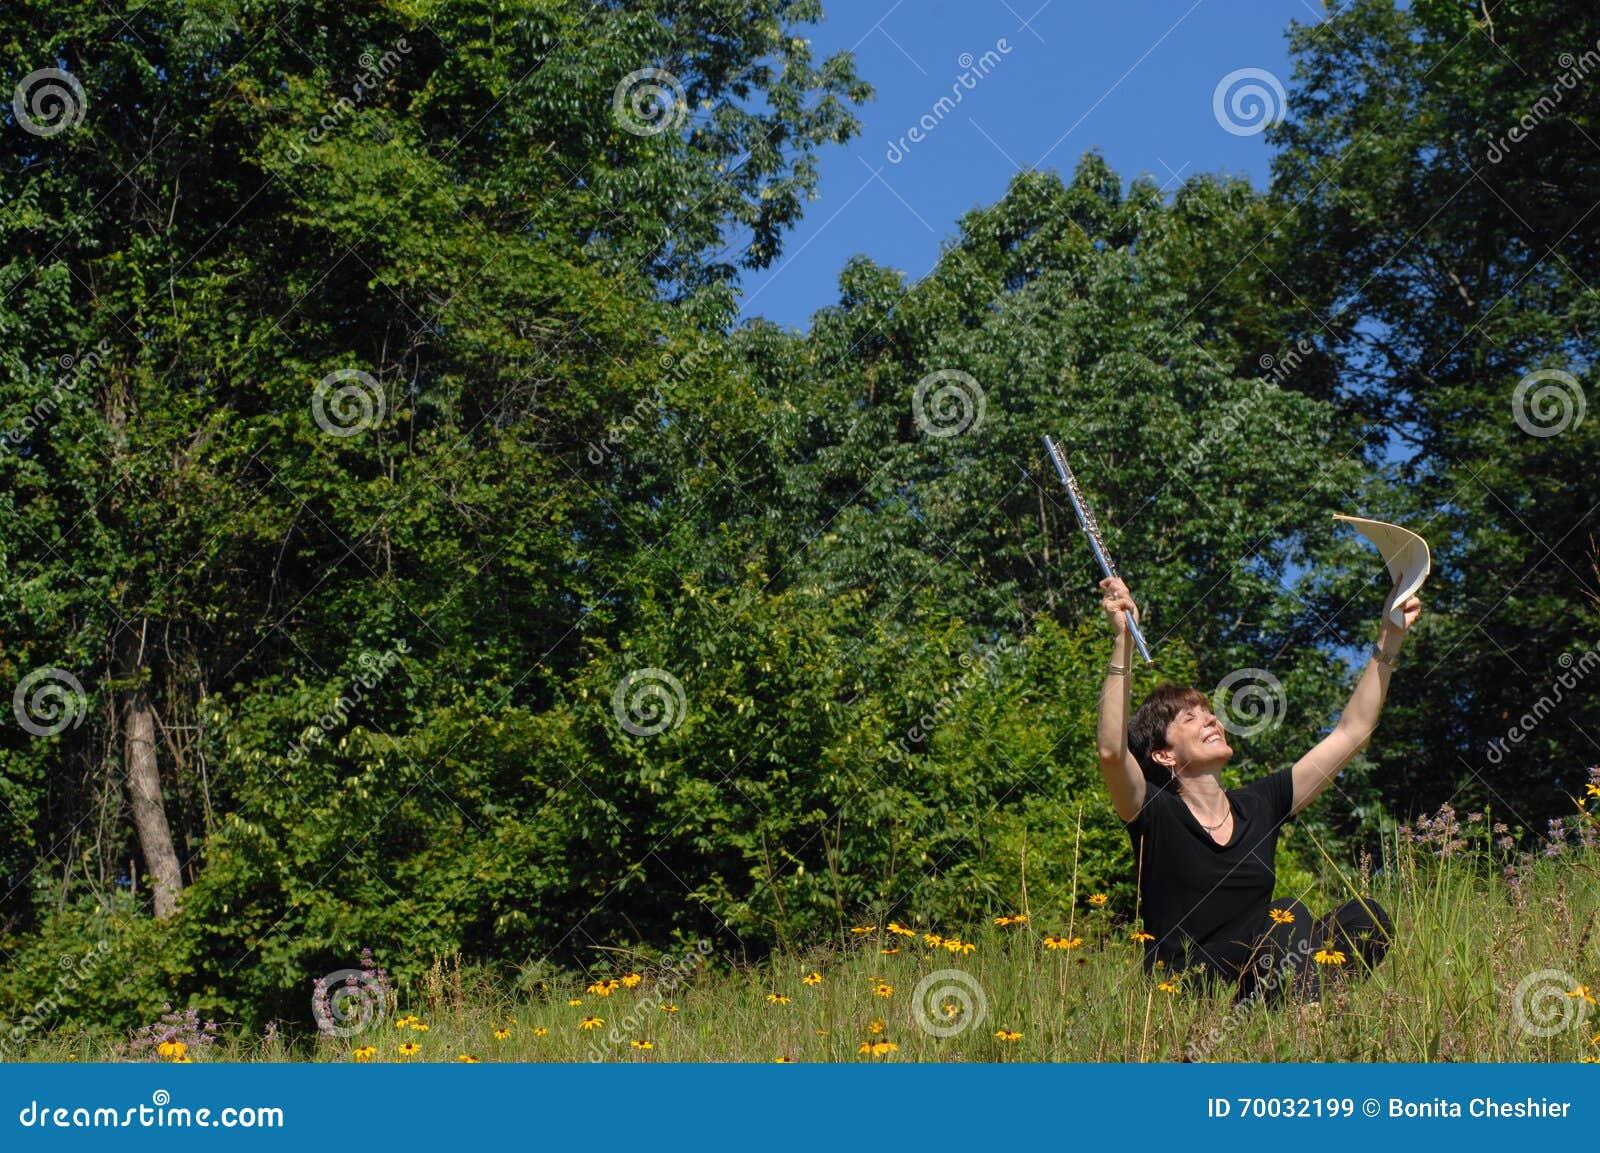 Happy Spirit stock image  Image of praising, radiant - 70032199